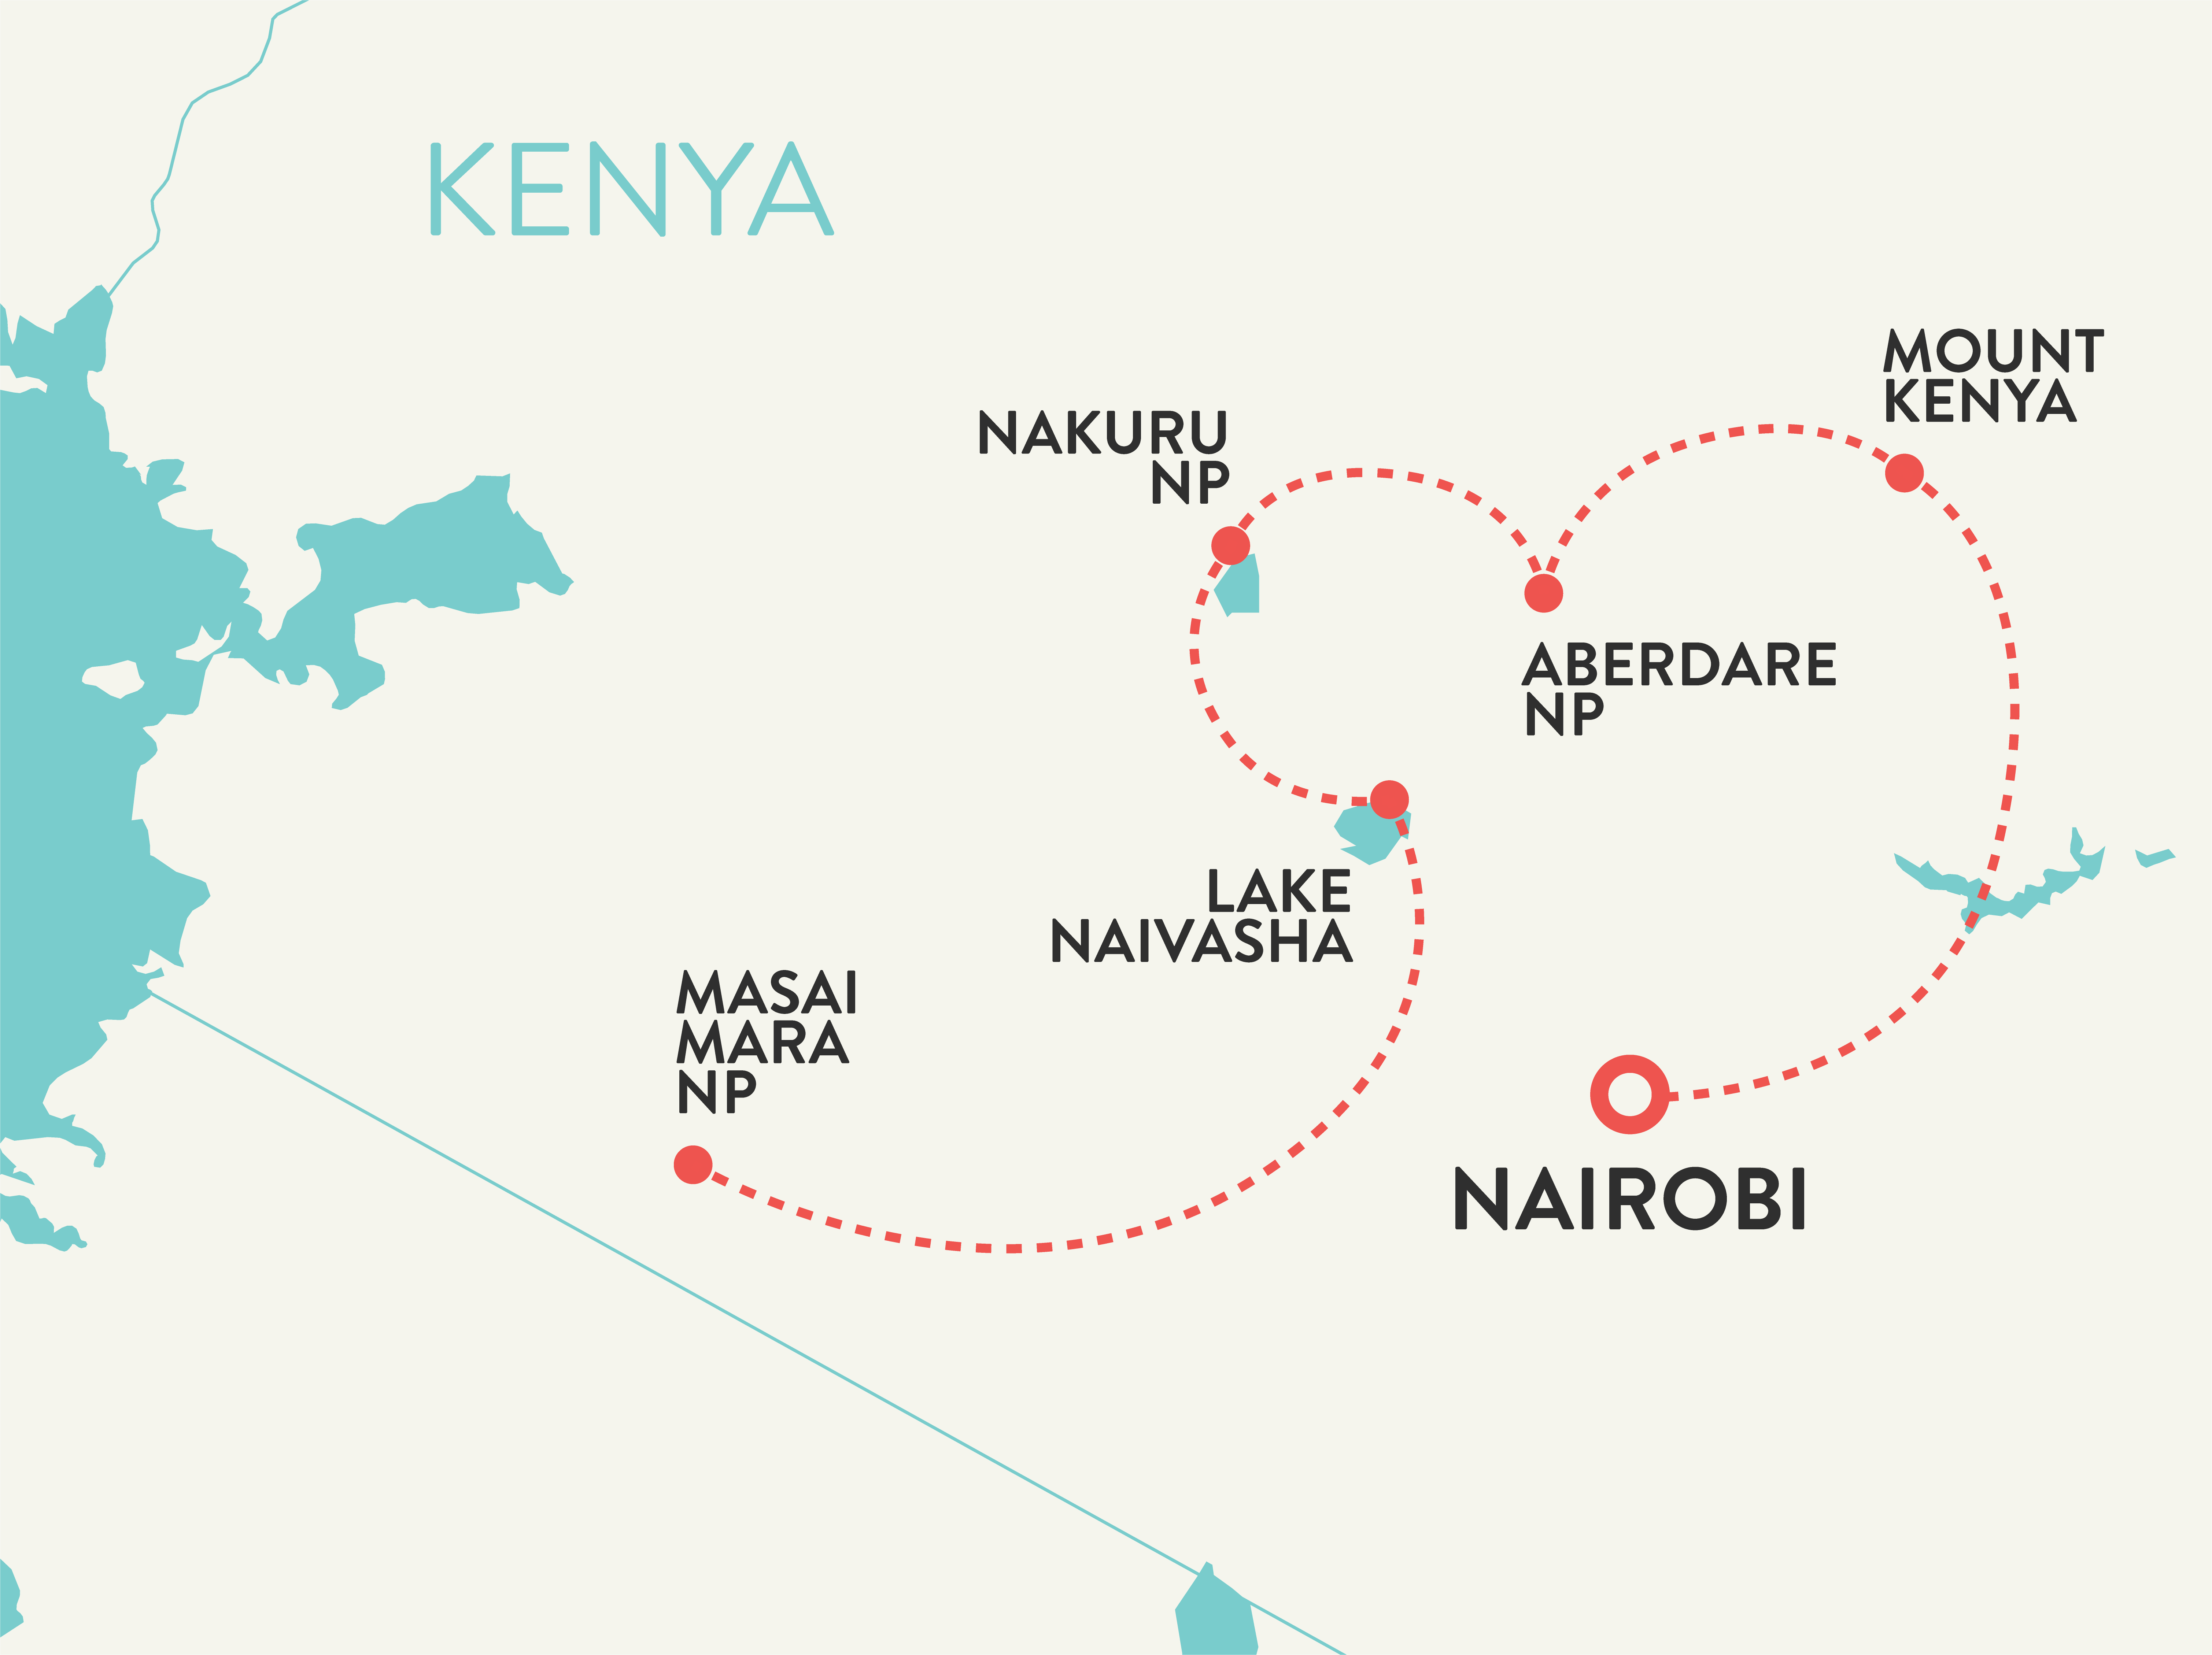 Kenya tour women solo travelers map